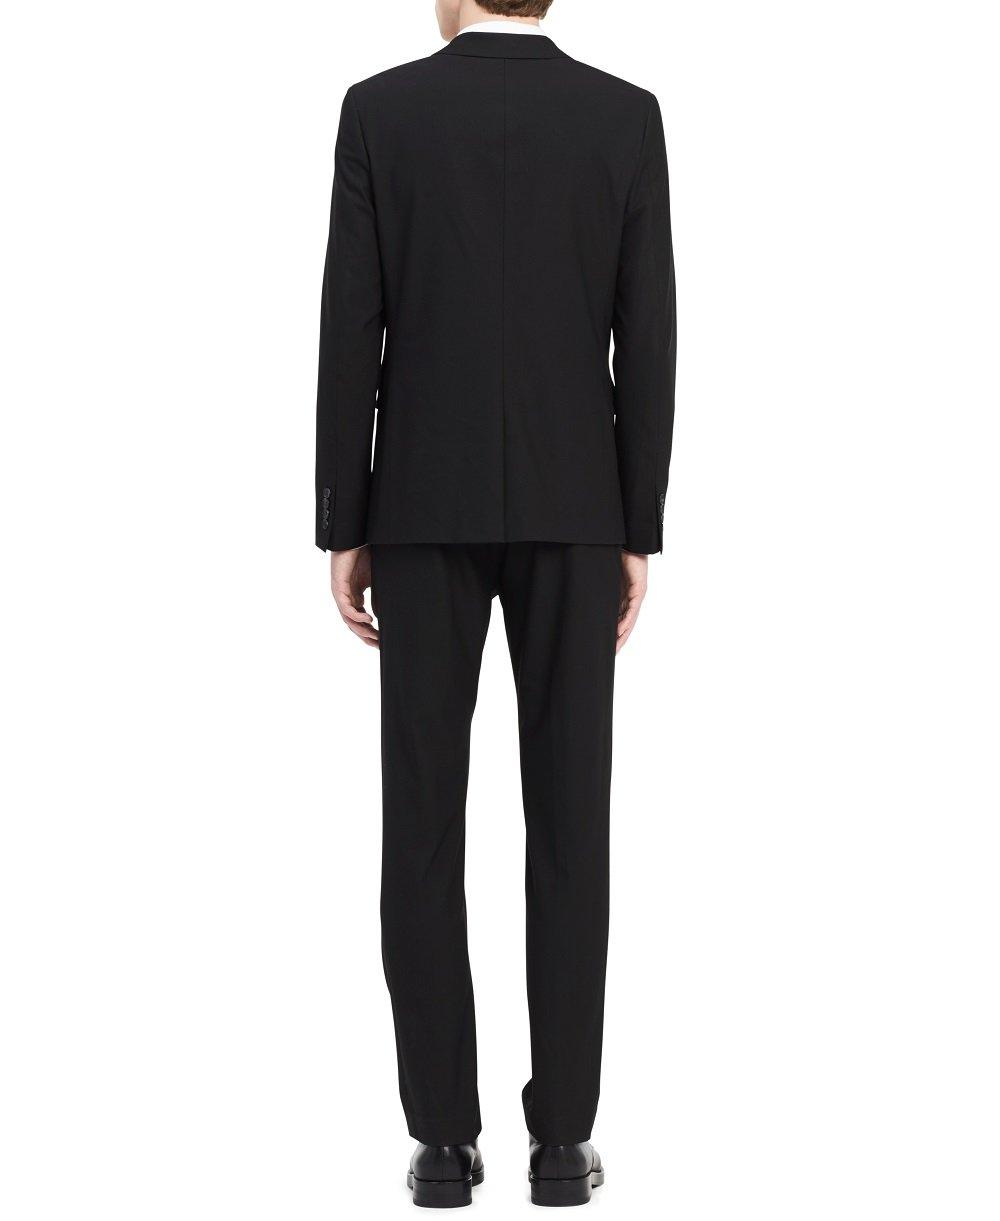 Calvin Klein Men's Infinite Slim Fit Suit Jacket 4-Way Stretch, Black, 2X-Large R by Calvin Klein (Image #2)